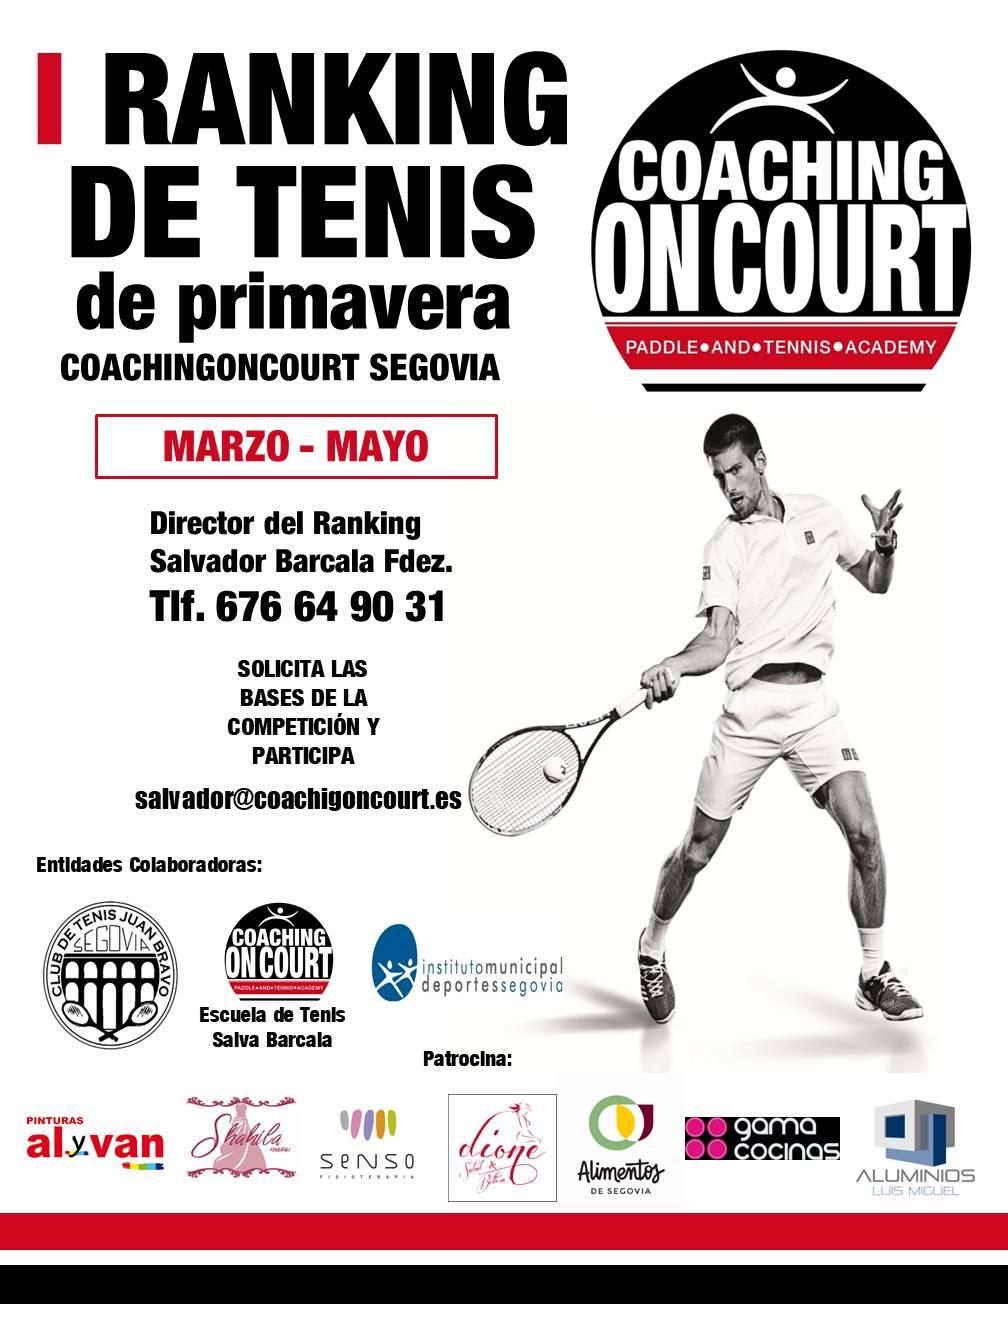 I Ránking de Tenis de Primavera – Coaching On Court Segovia